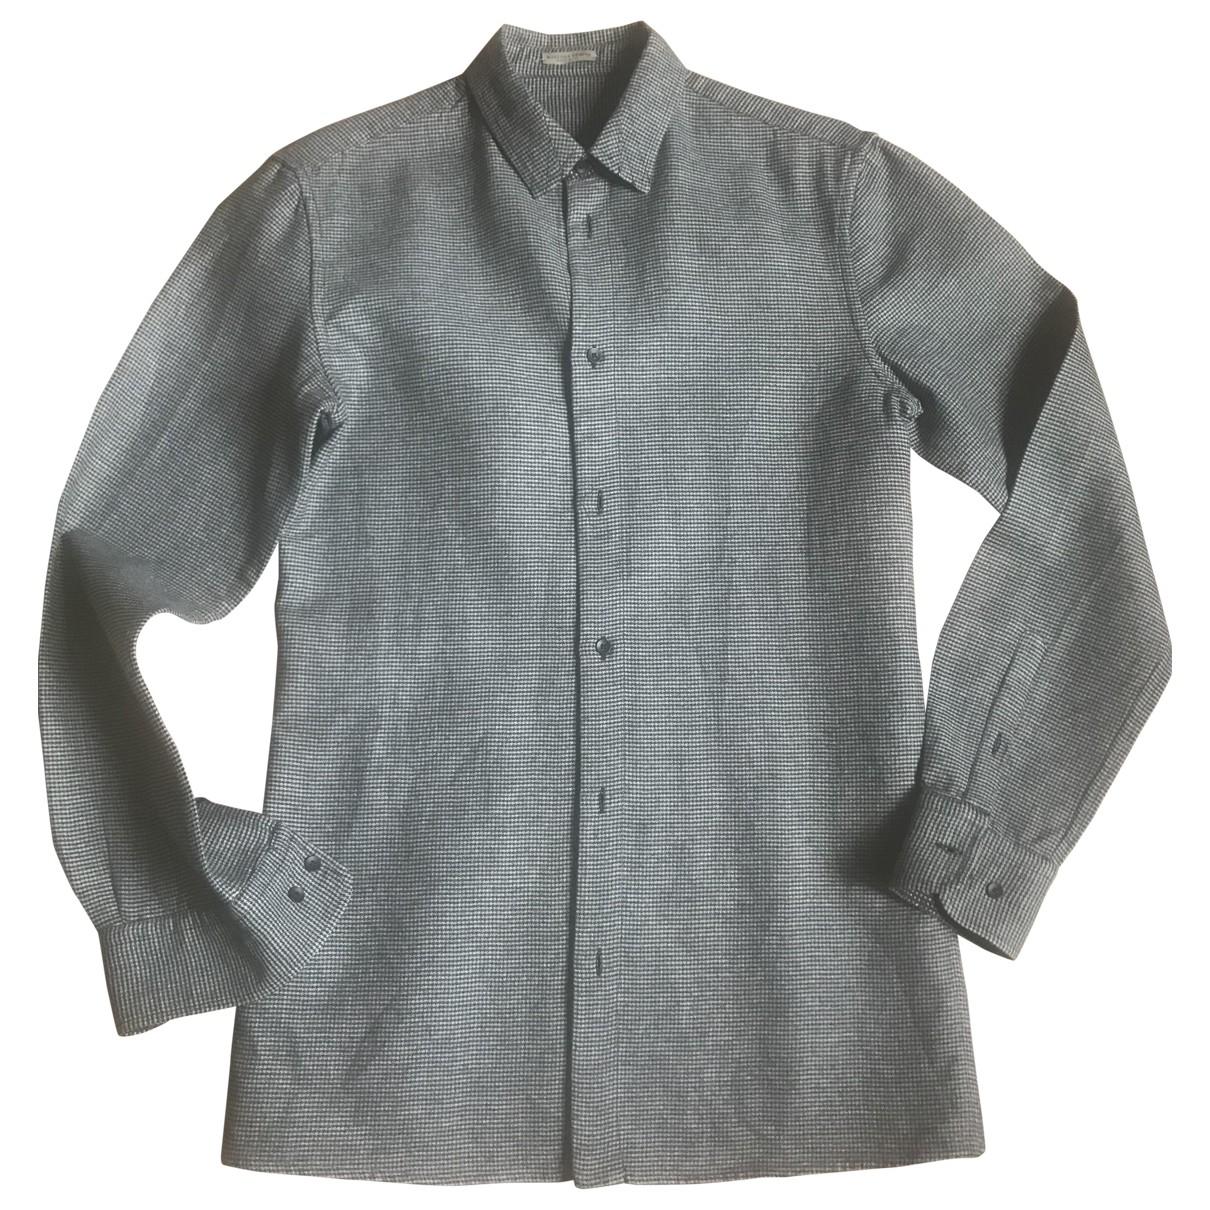 Bottega Veneta \N Hemden in  Grau Baumwolle